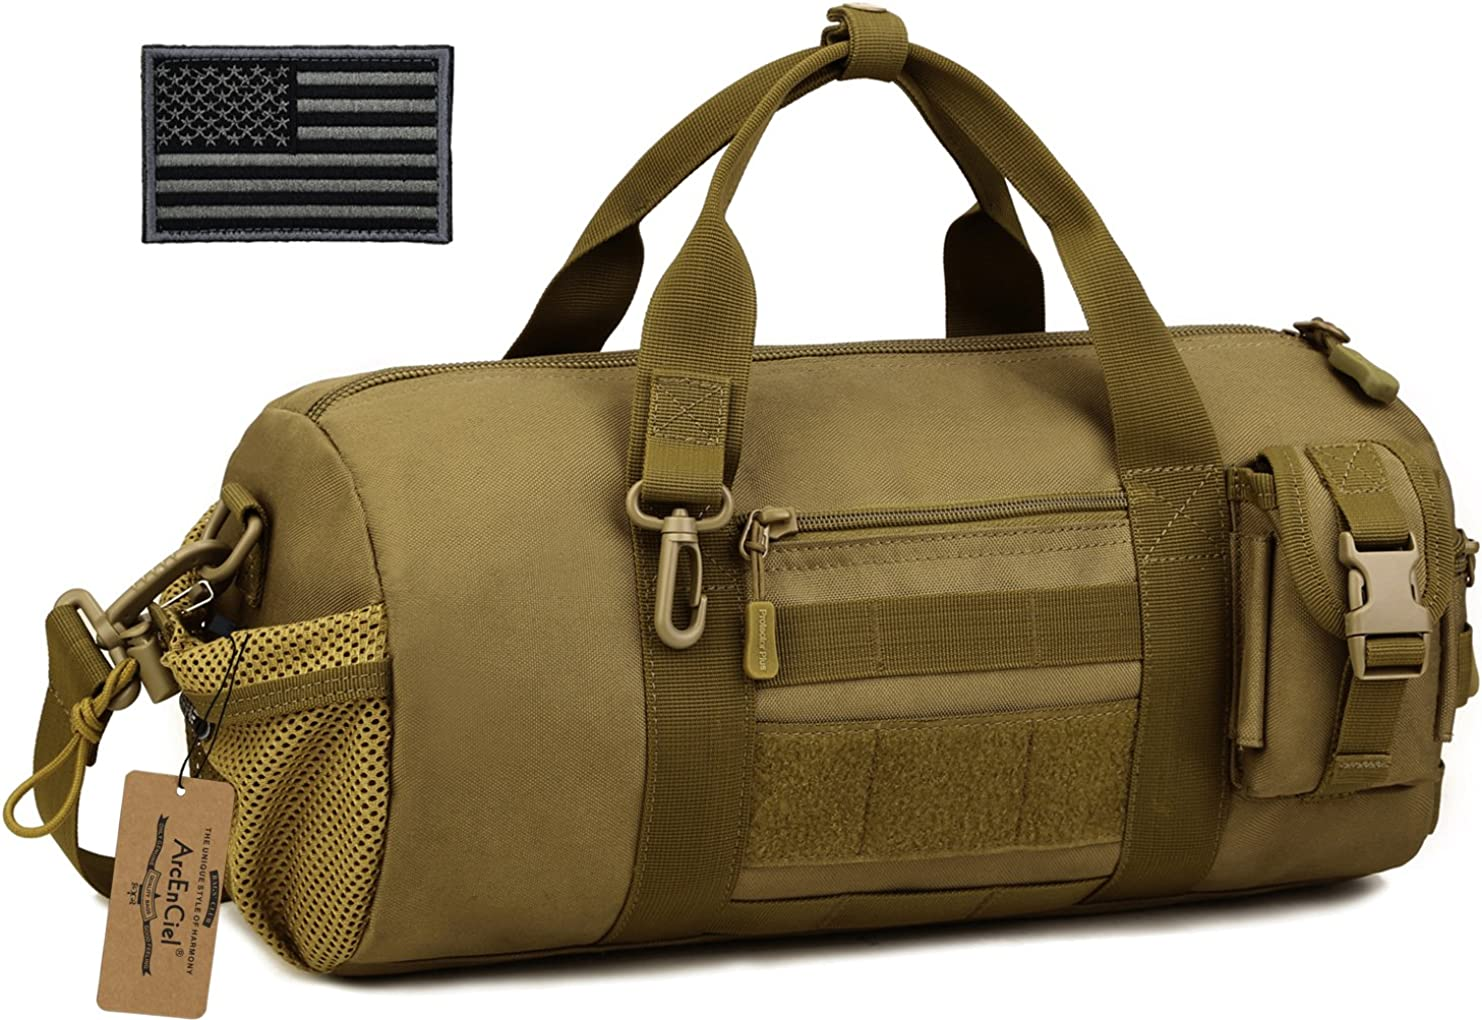 ArcEnCiel Tactical Duffle Bag Men Gym Pack Military Molle Shoulder Bags Shoes Storage Sports Handbag with Patch